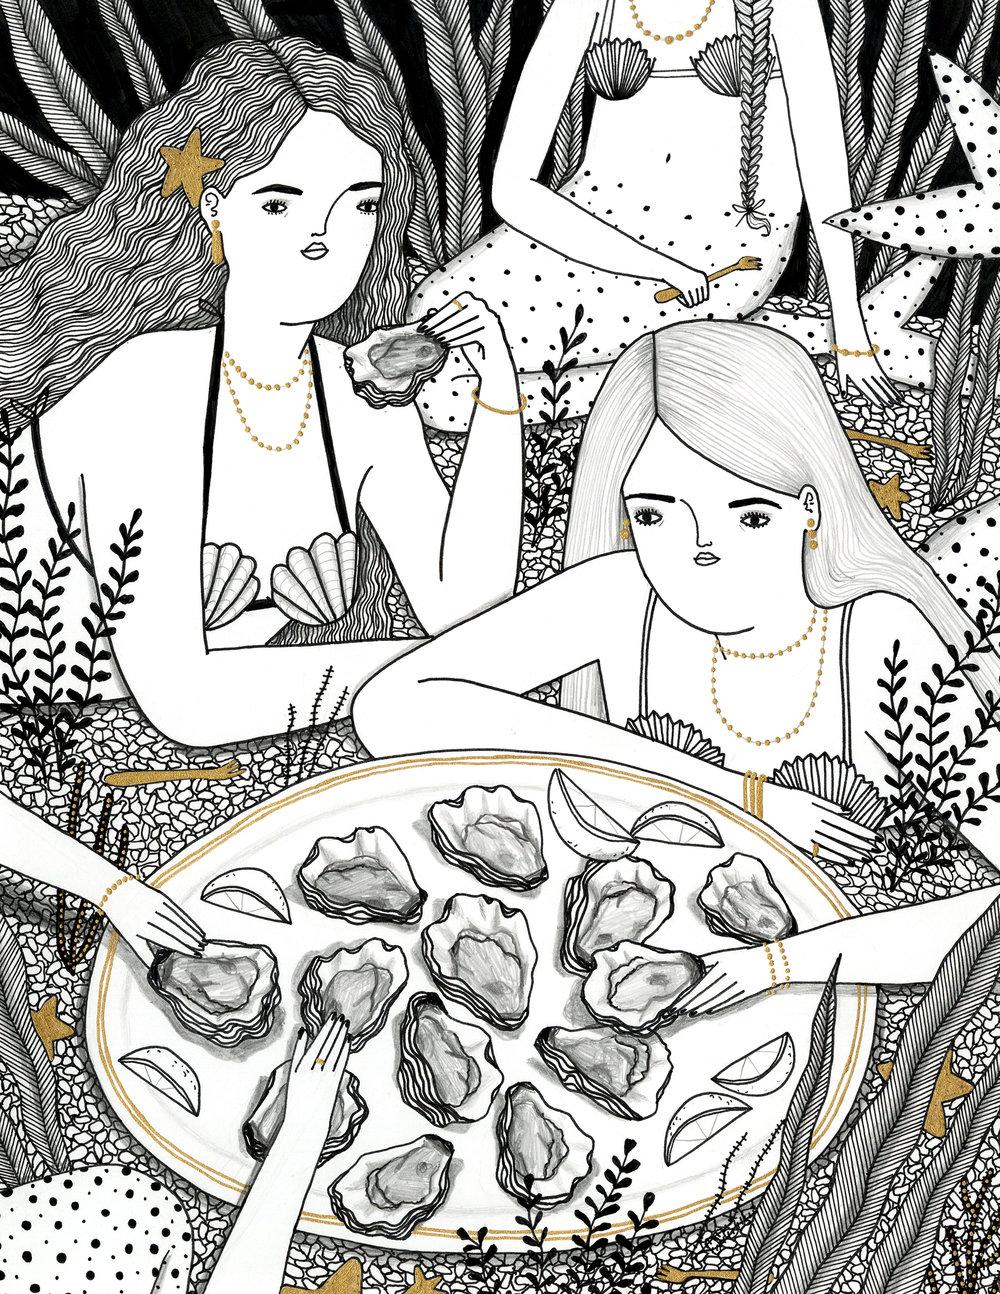 Oyster Mermaids